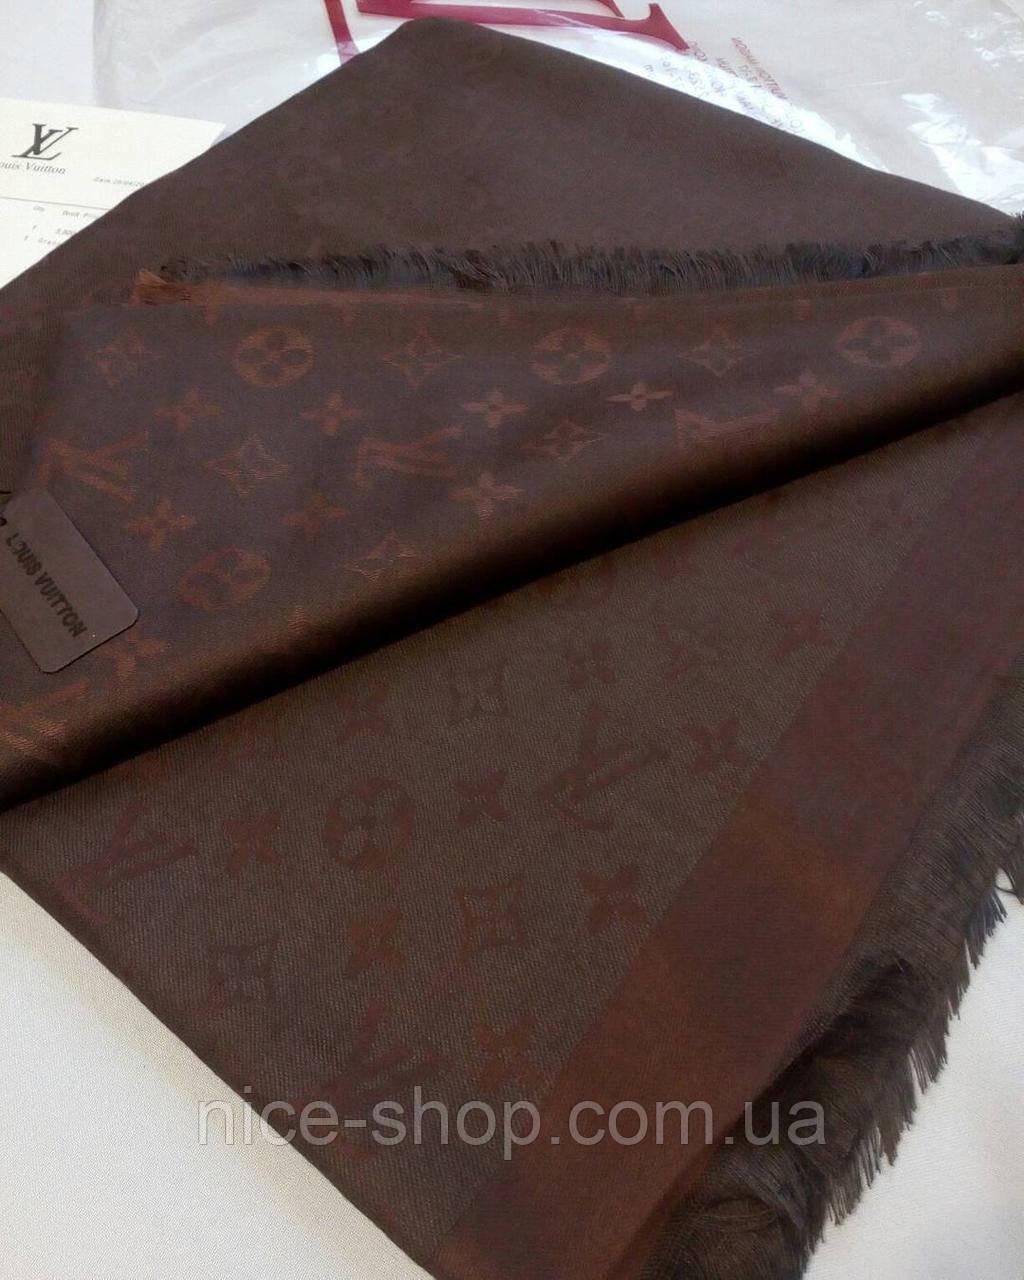 Платок Louis Vuitton черный шоколад  комби